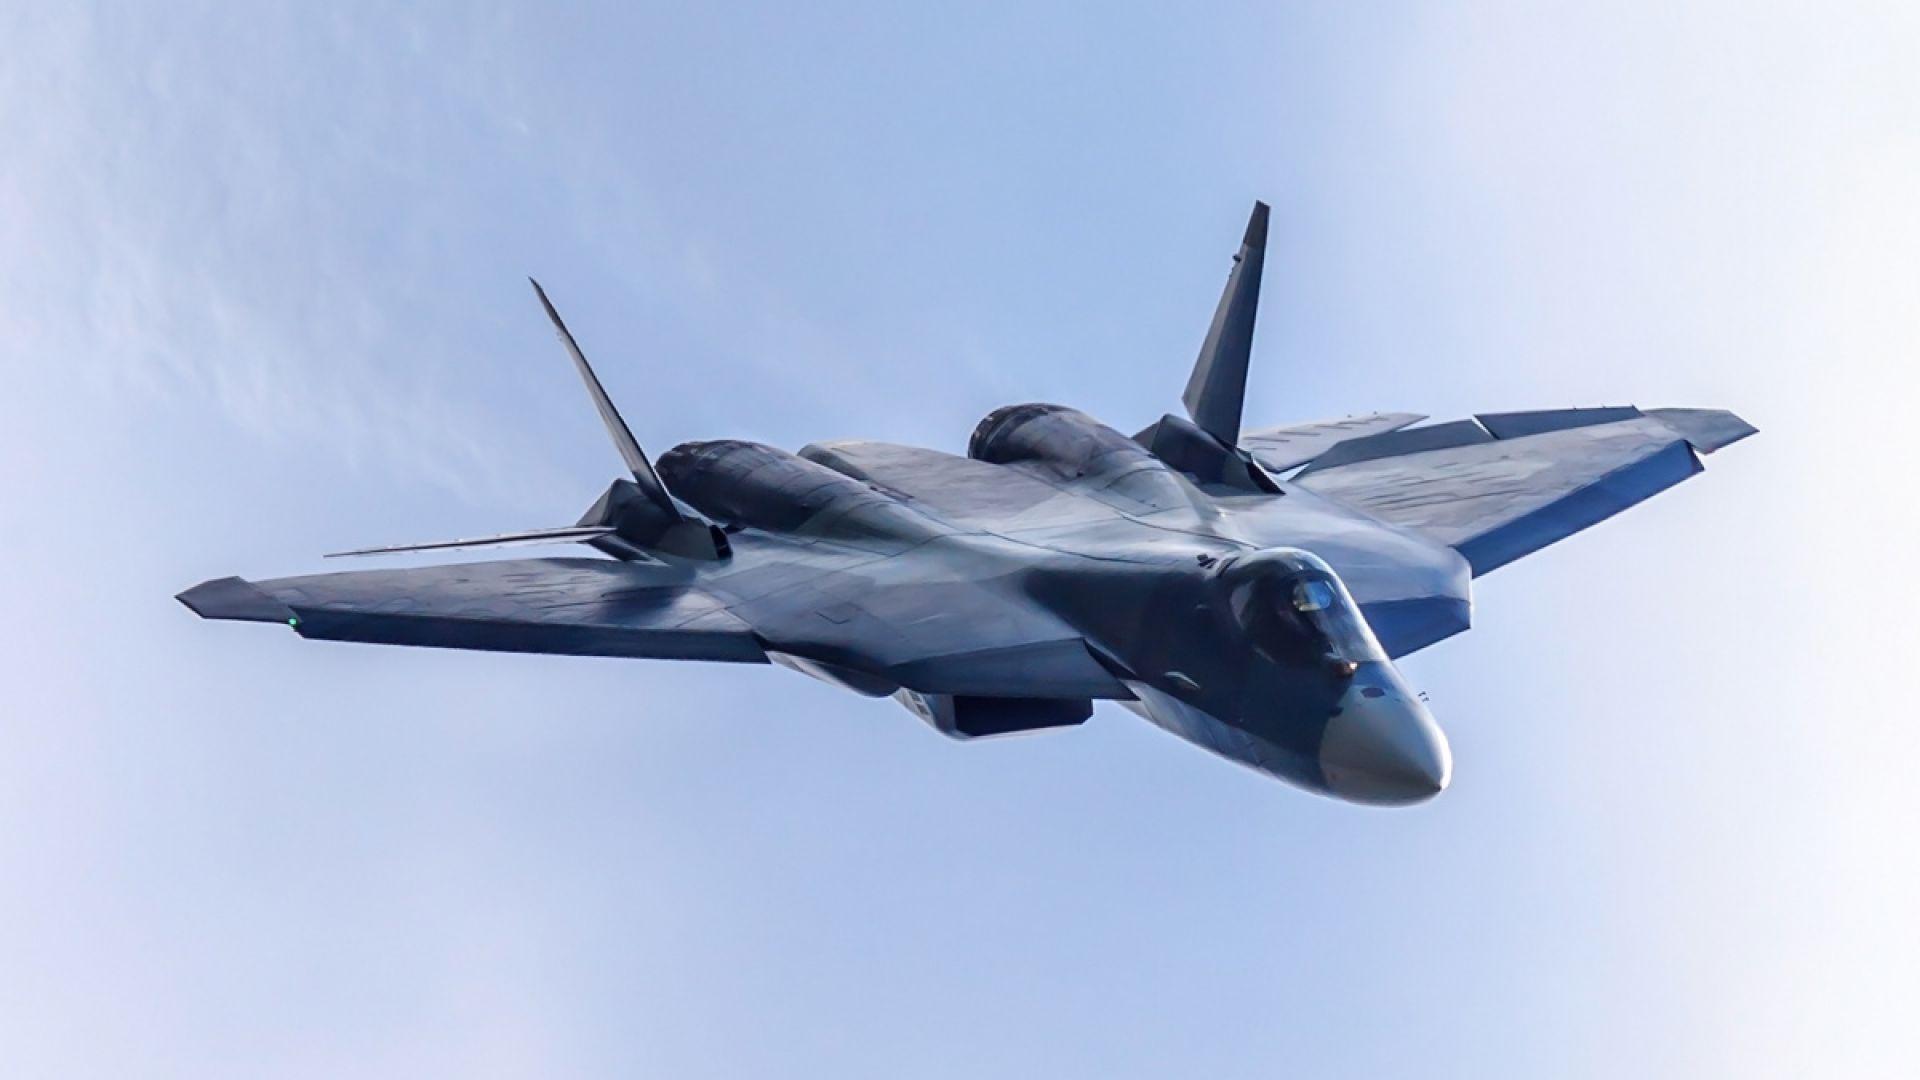 Русия публикува ново видео с полет на стелт изтребителя Су-57